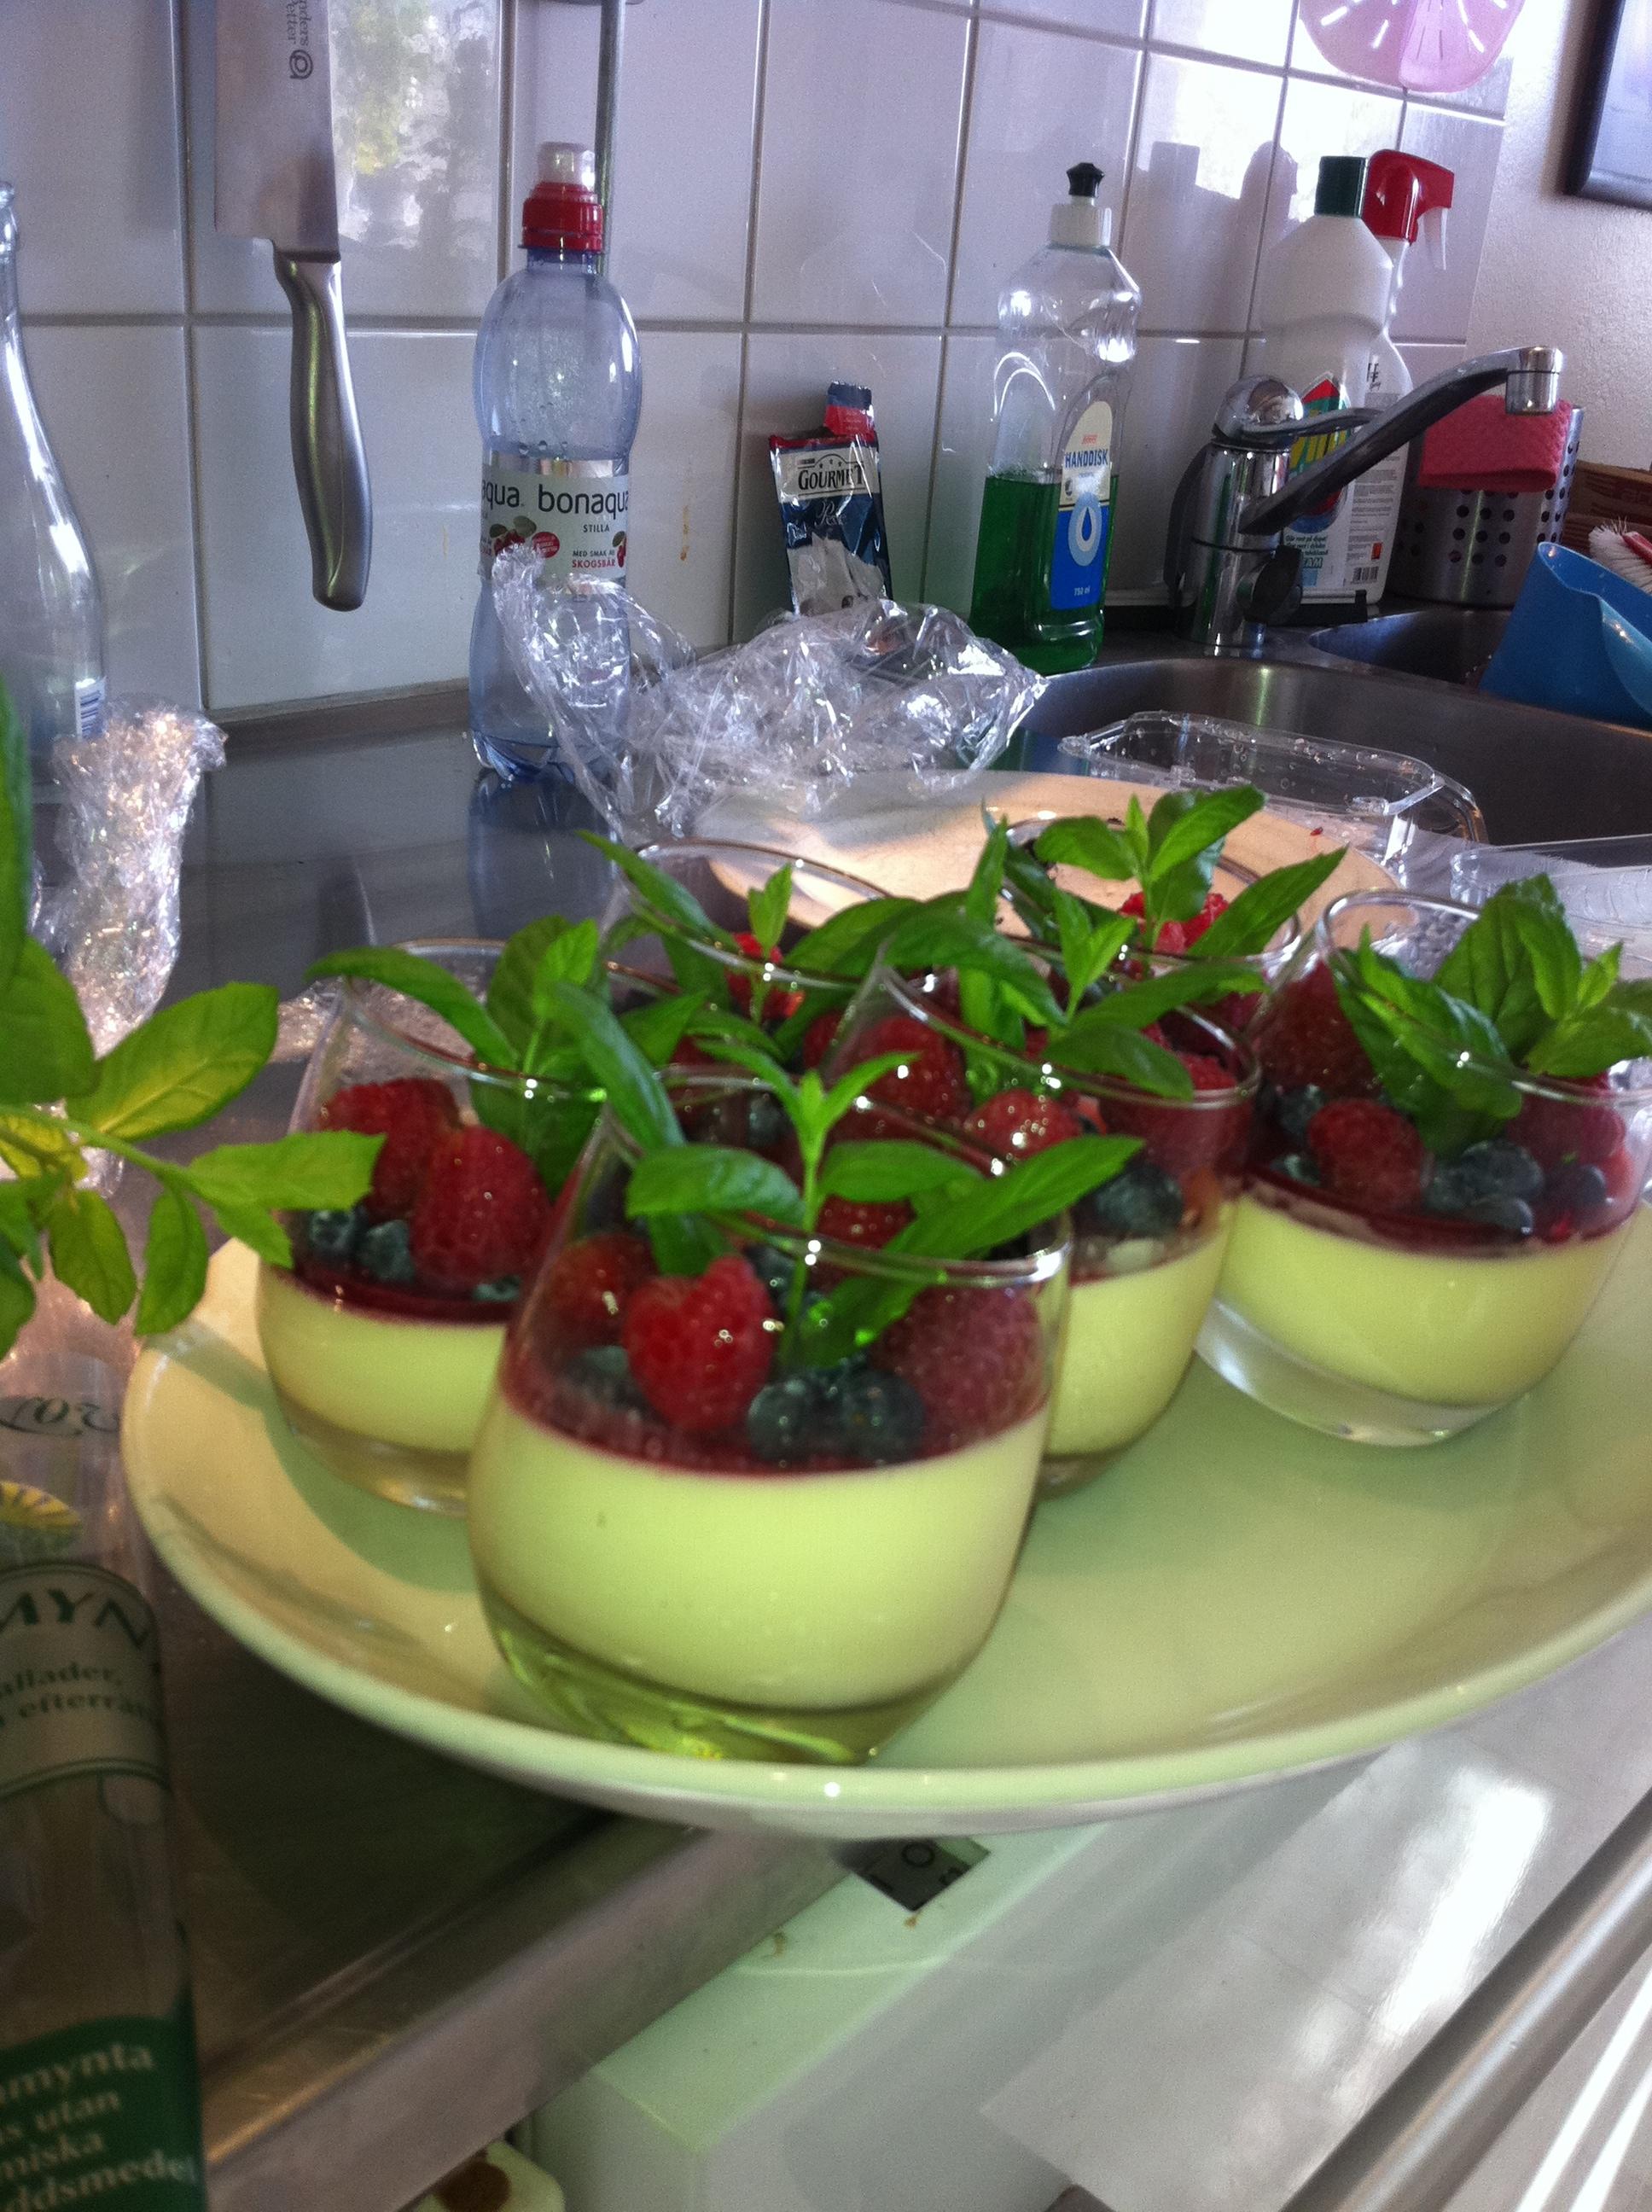 hallonsås med gelatin